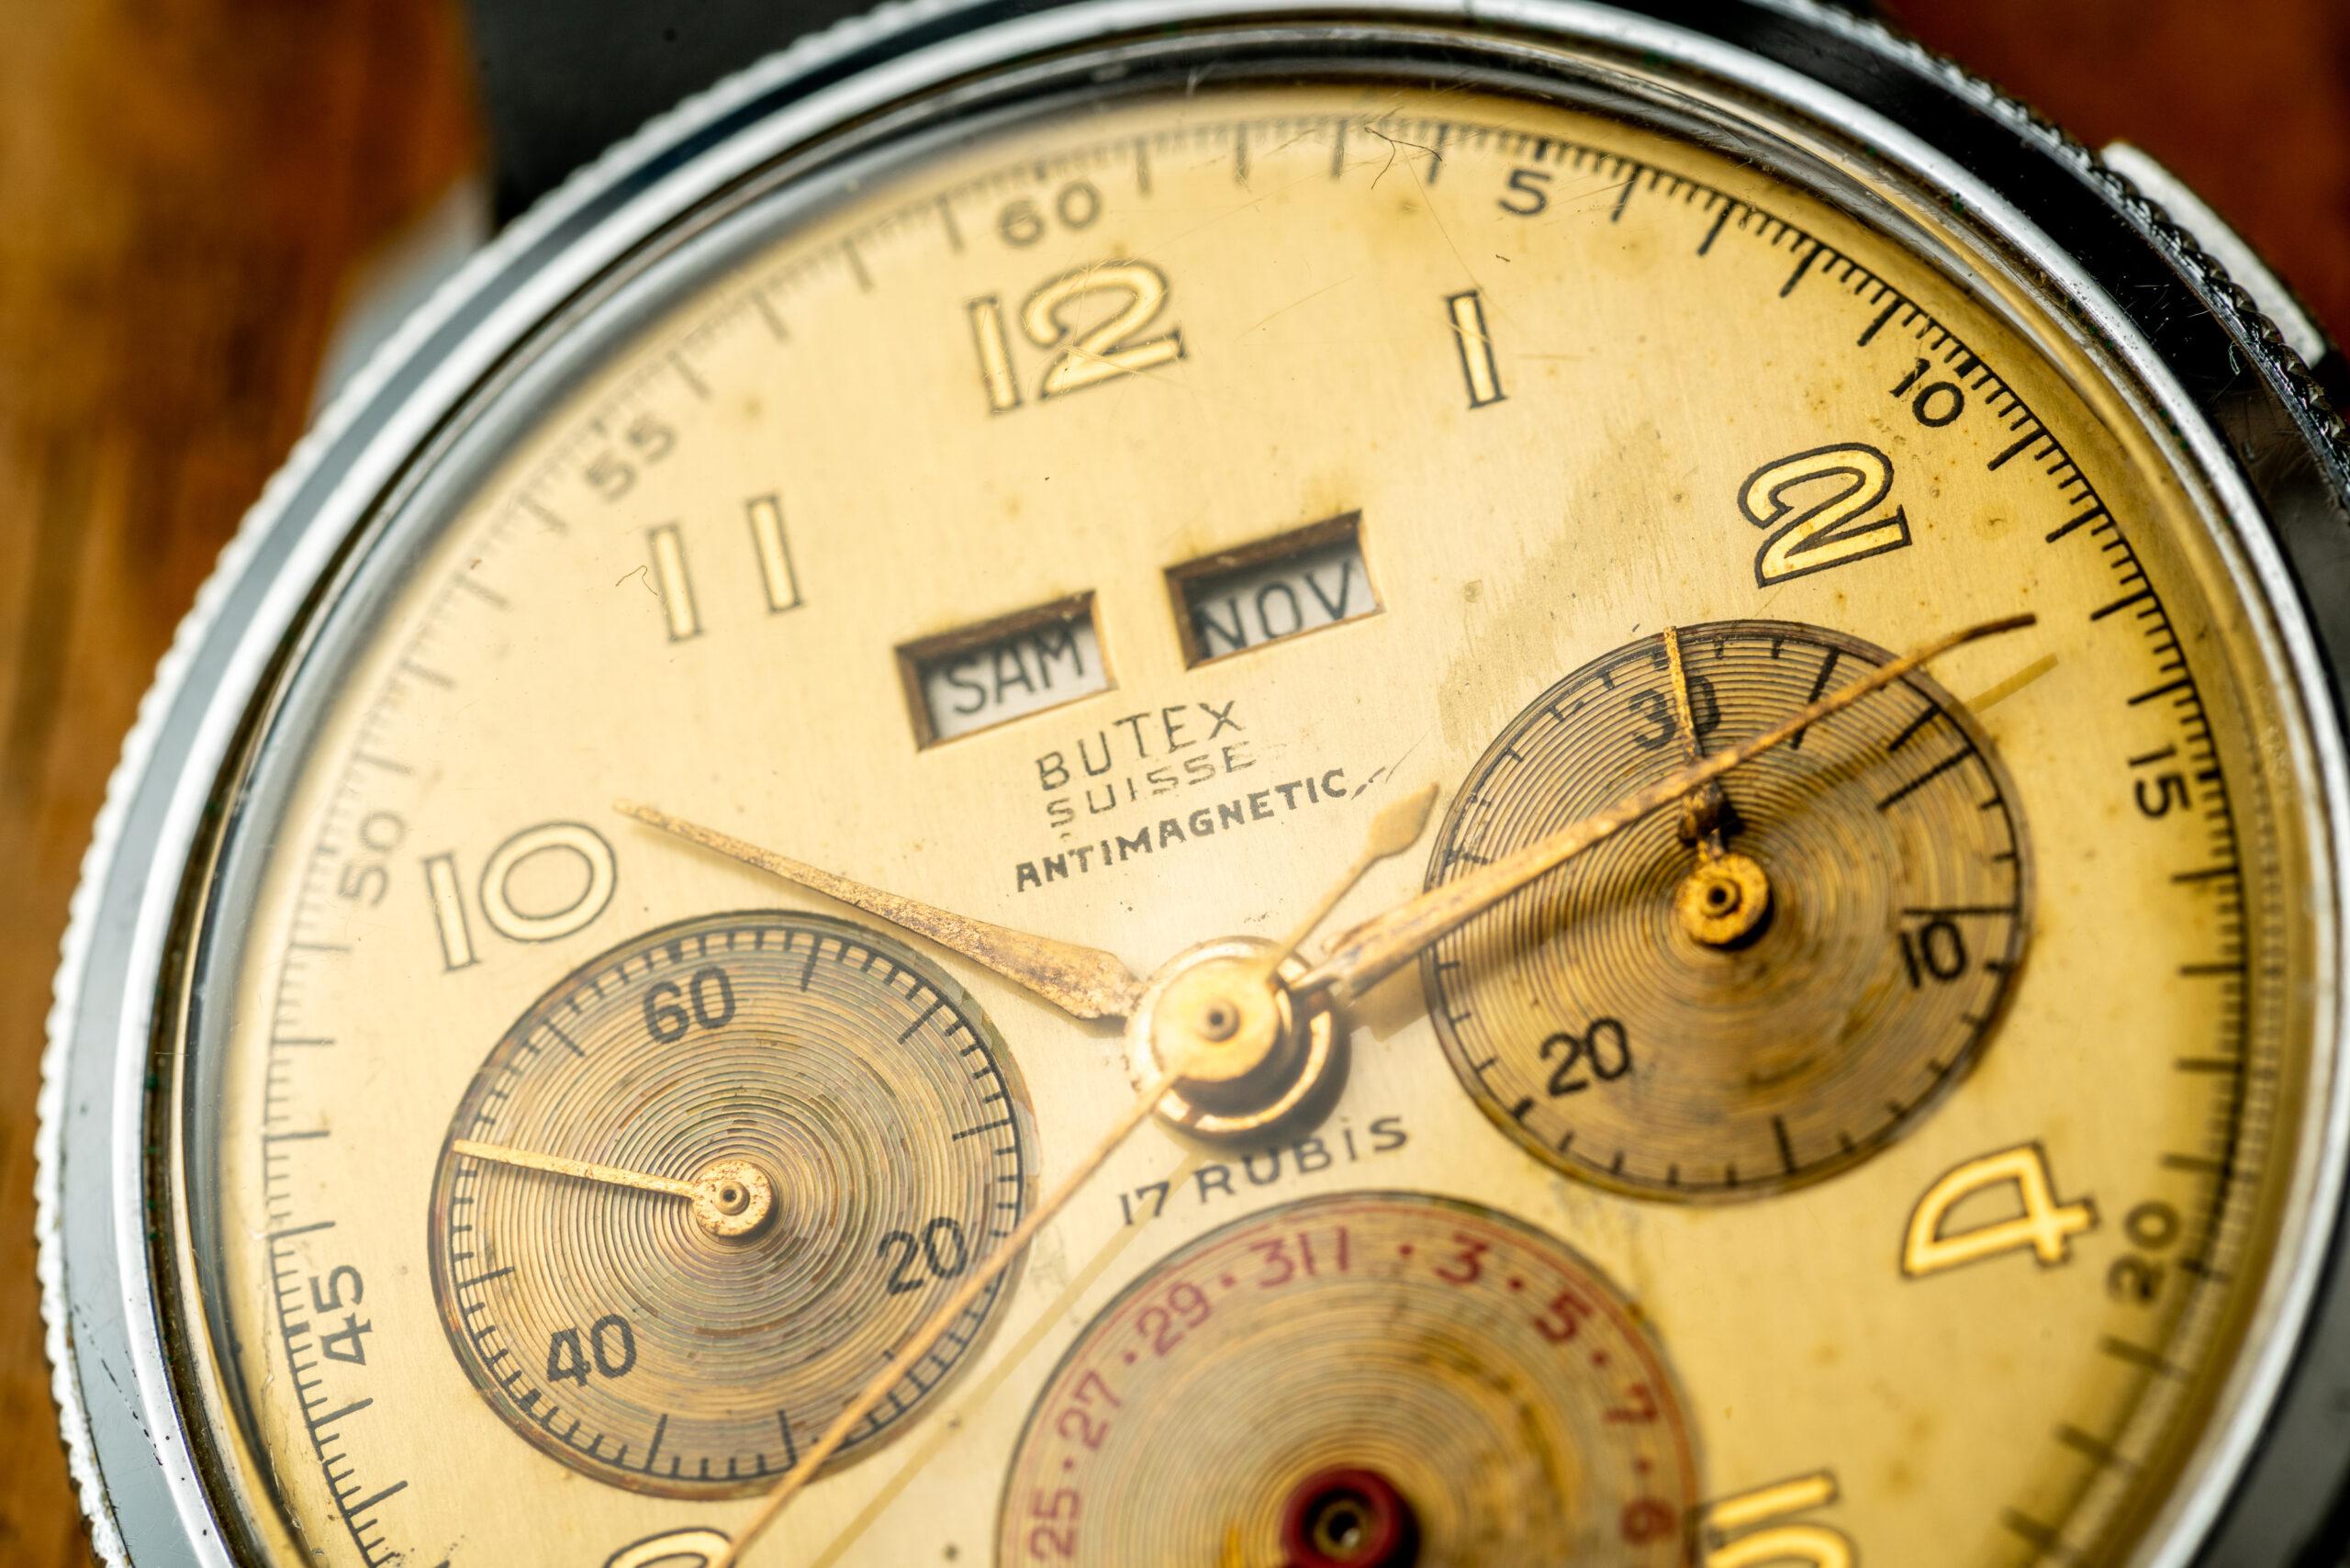 Vintage Butex Chronograph Triple Calendar watch macro